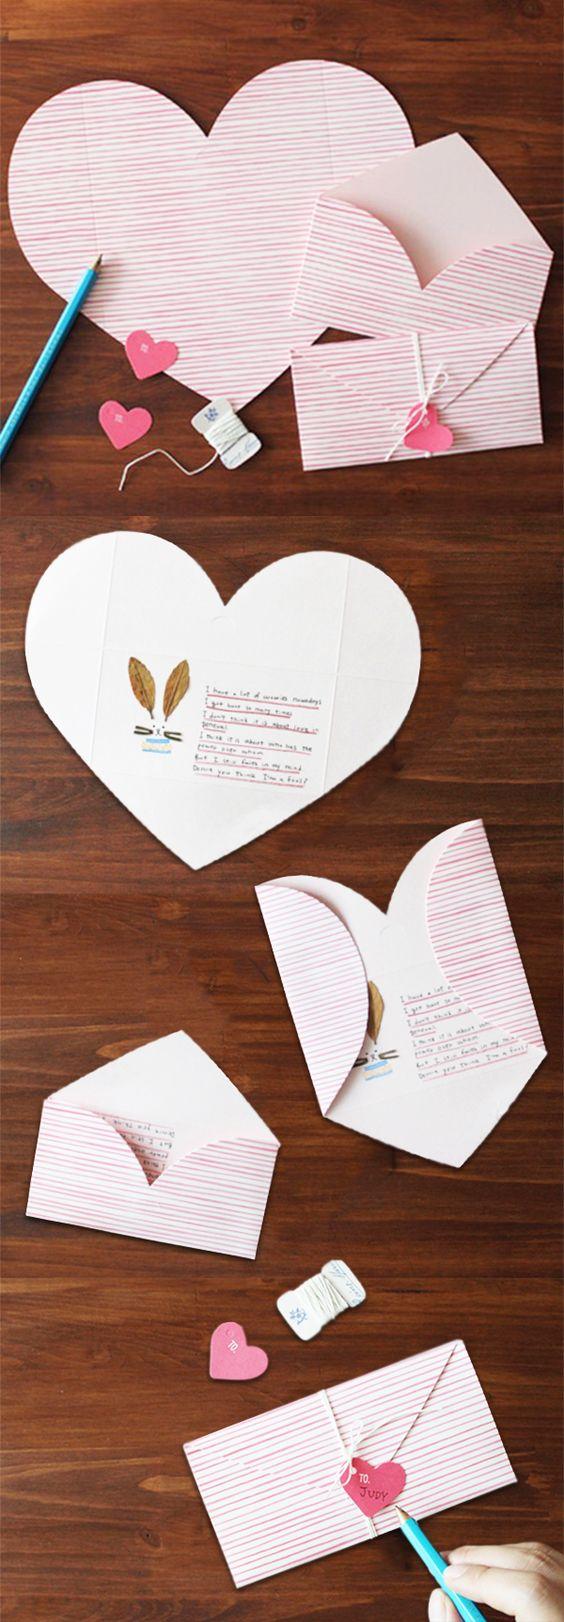 7fd5c31d0 أفضل هدايا عيد الحب Valentine's day 2018 - أفكار يدوية بسيطة - الحب ...